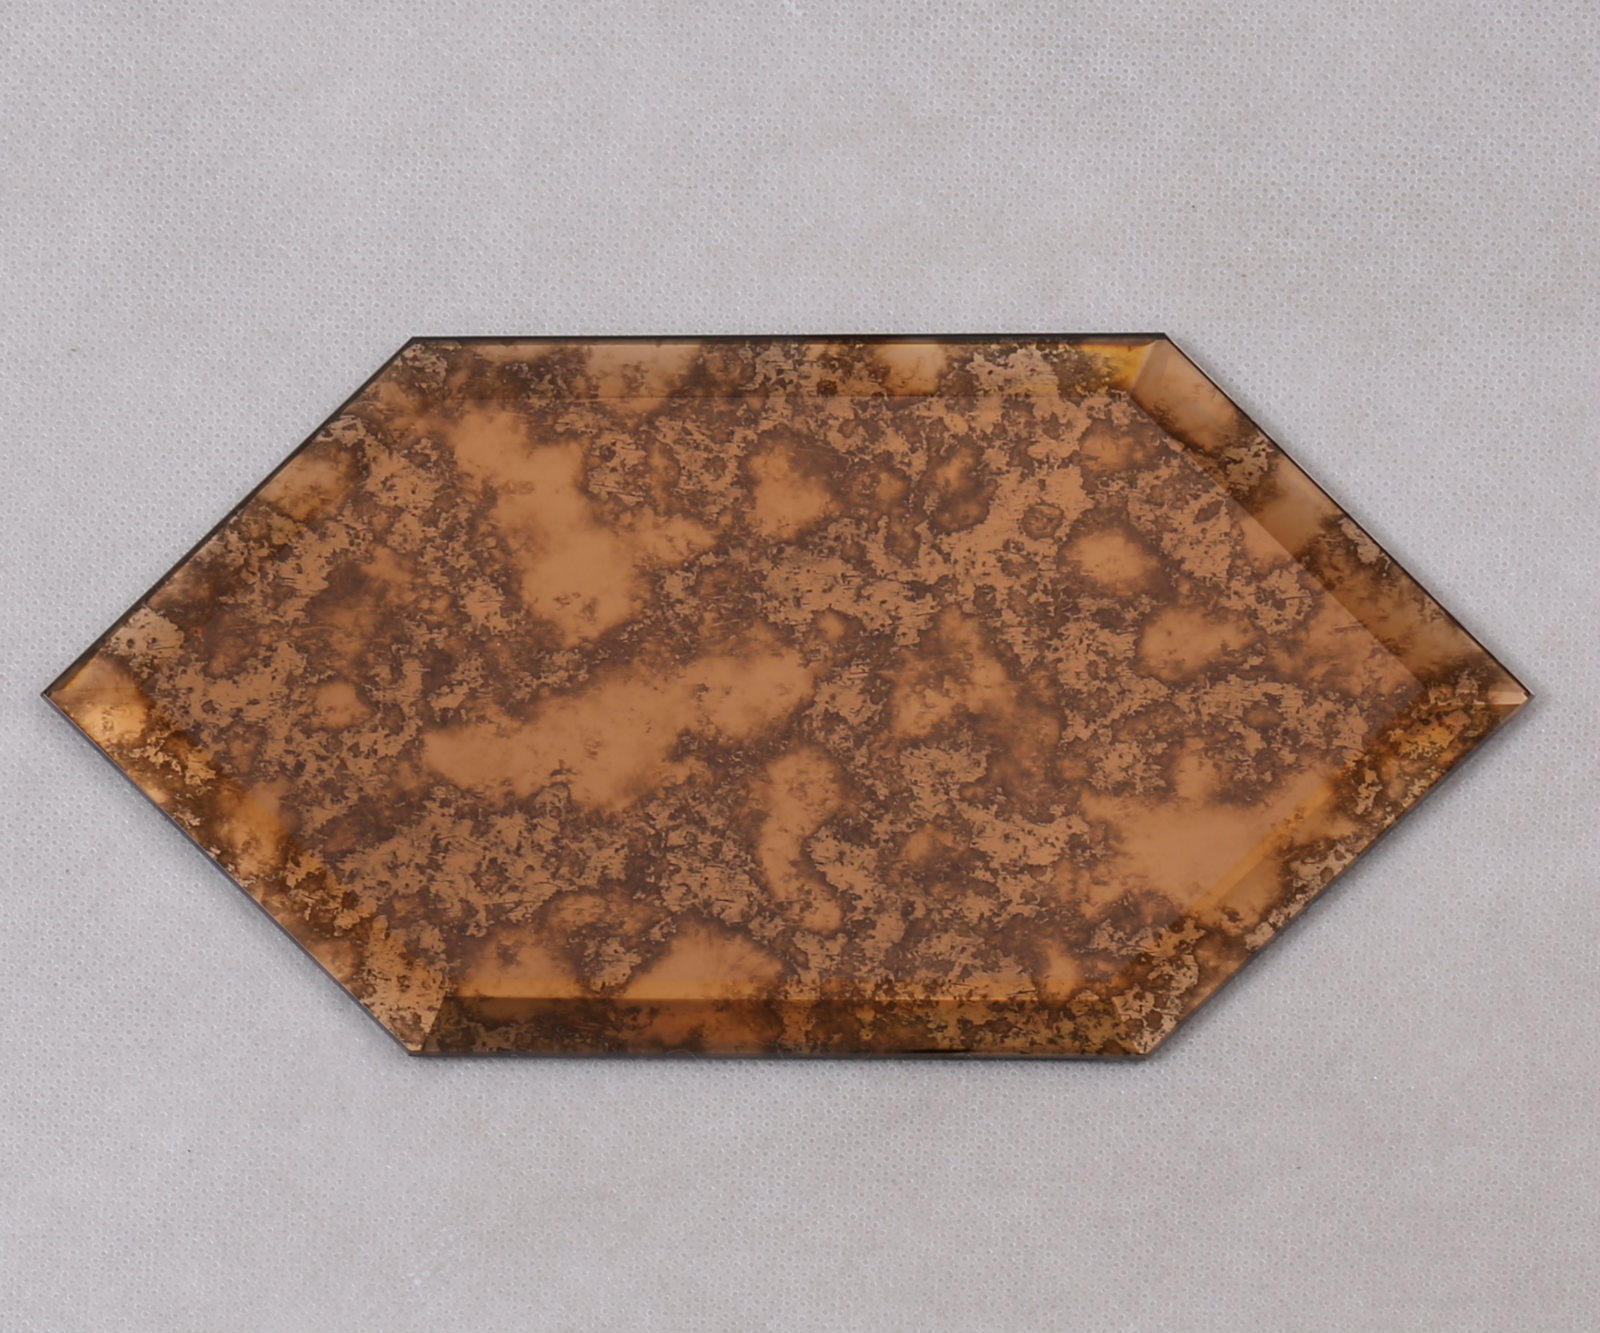 Hexagon Antique Beveled Glass Mosaic Tiles HFG12